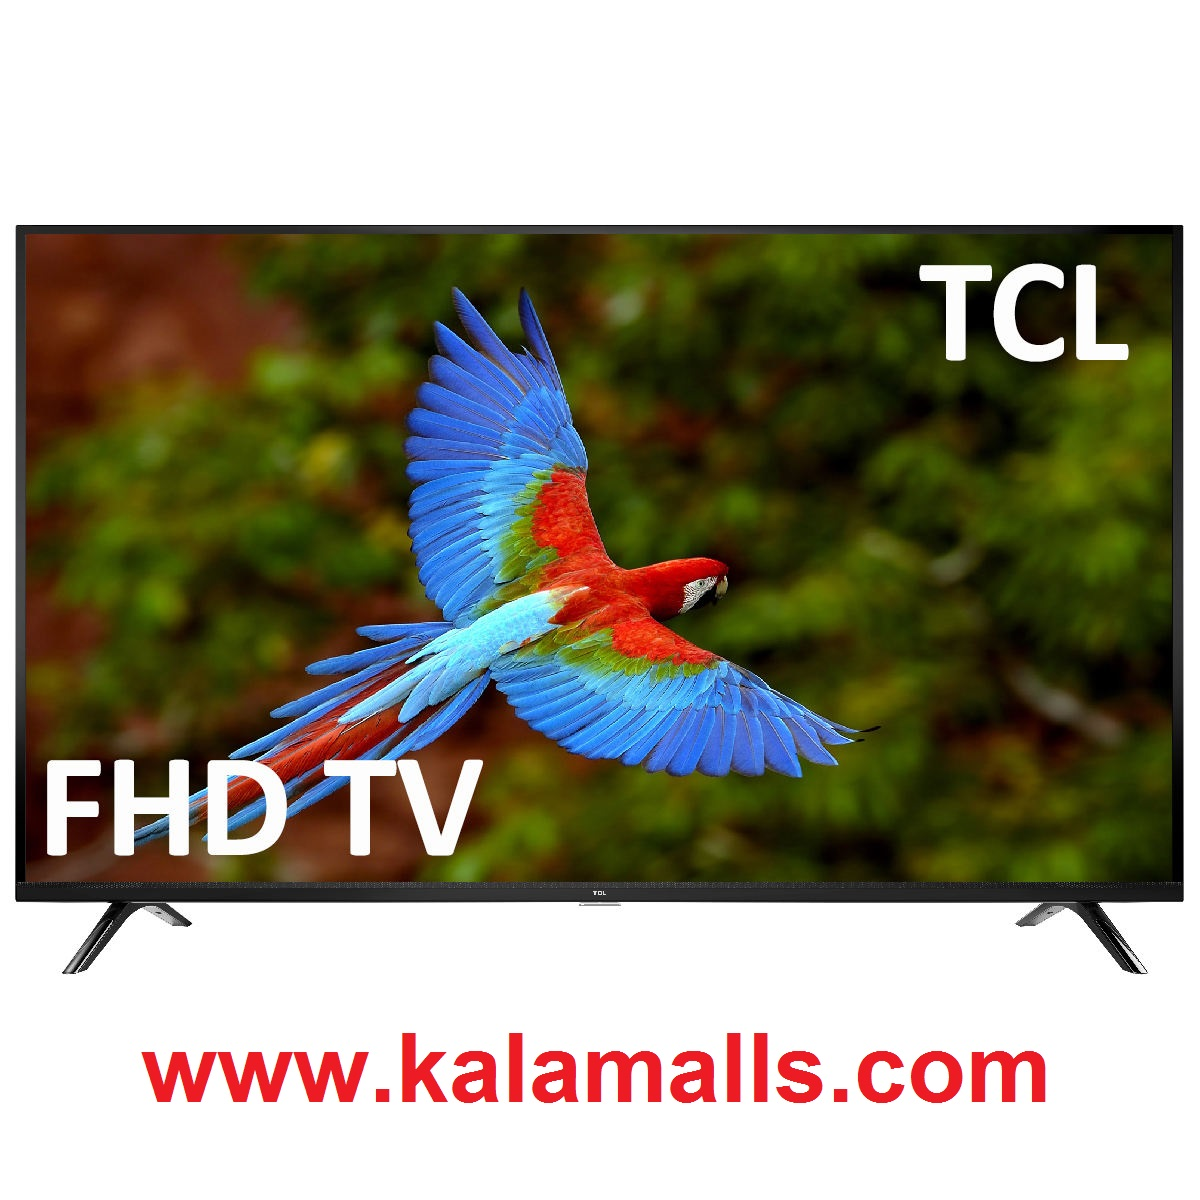 تصویر تلویزیون ال ای دی تی سی ال مدل 43D3000i سایز 43 اینچ TCL 43D3000i Full HD